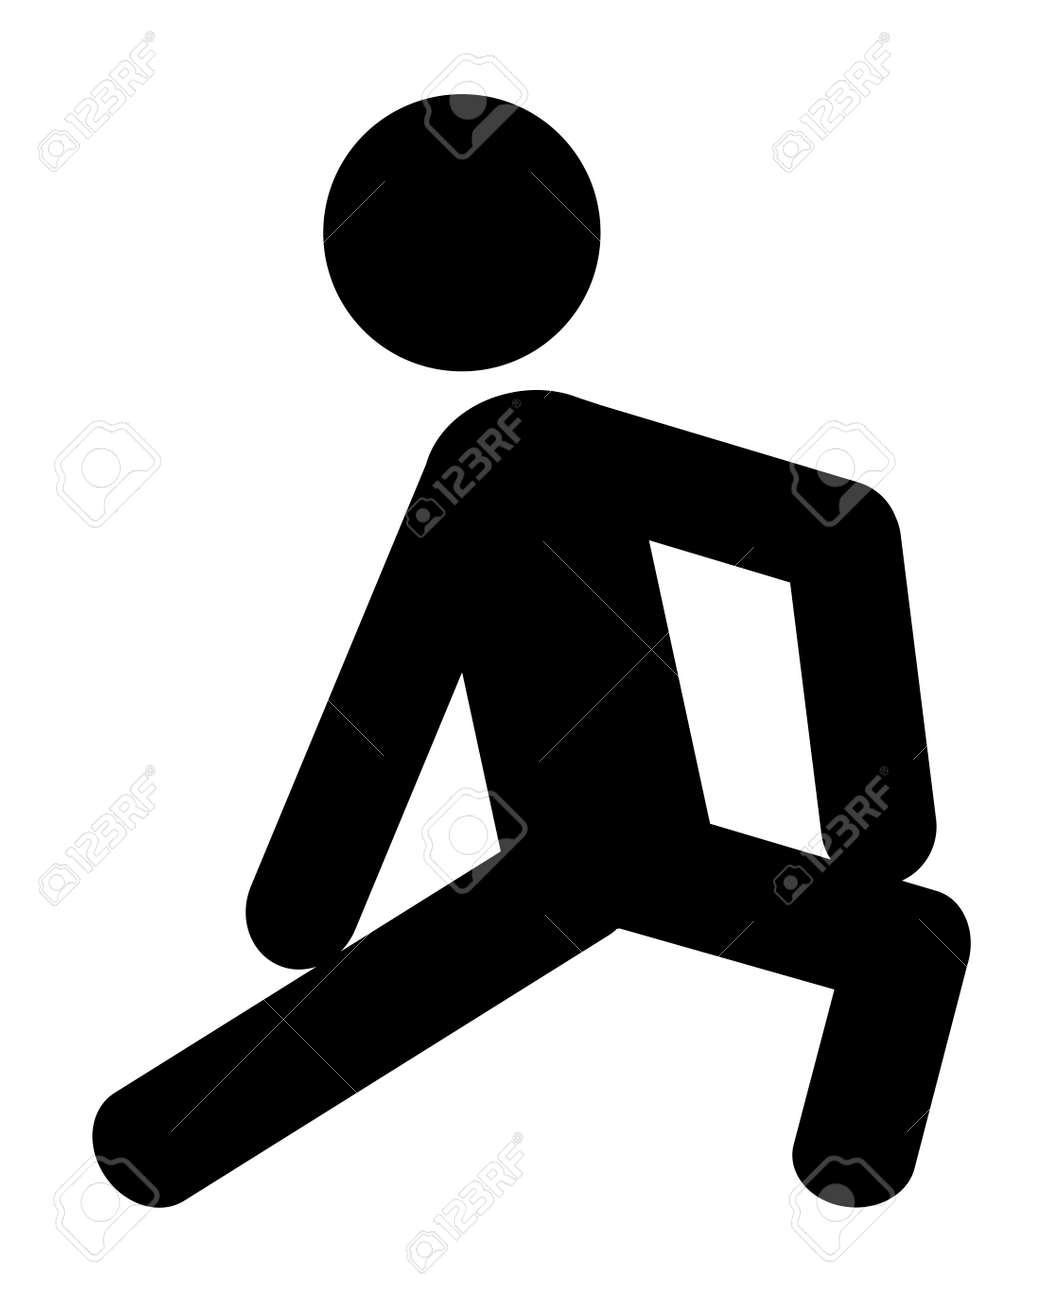 Humans are doing gymnastics - 156728613